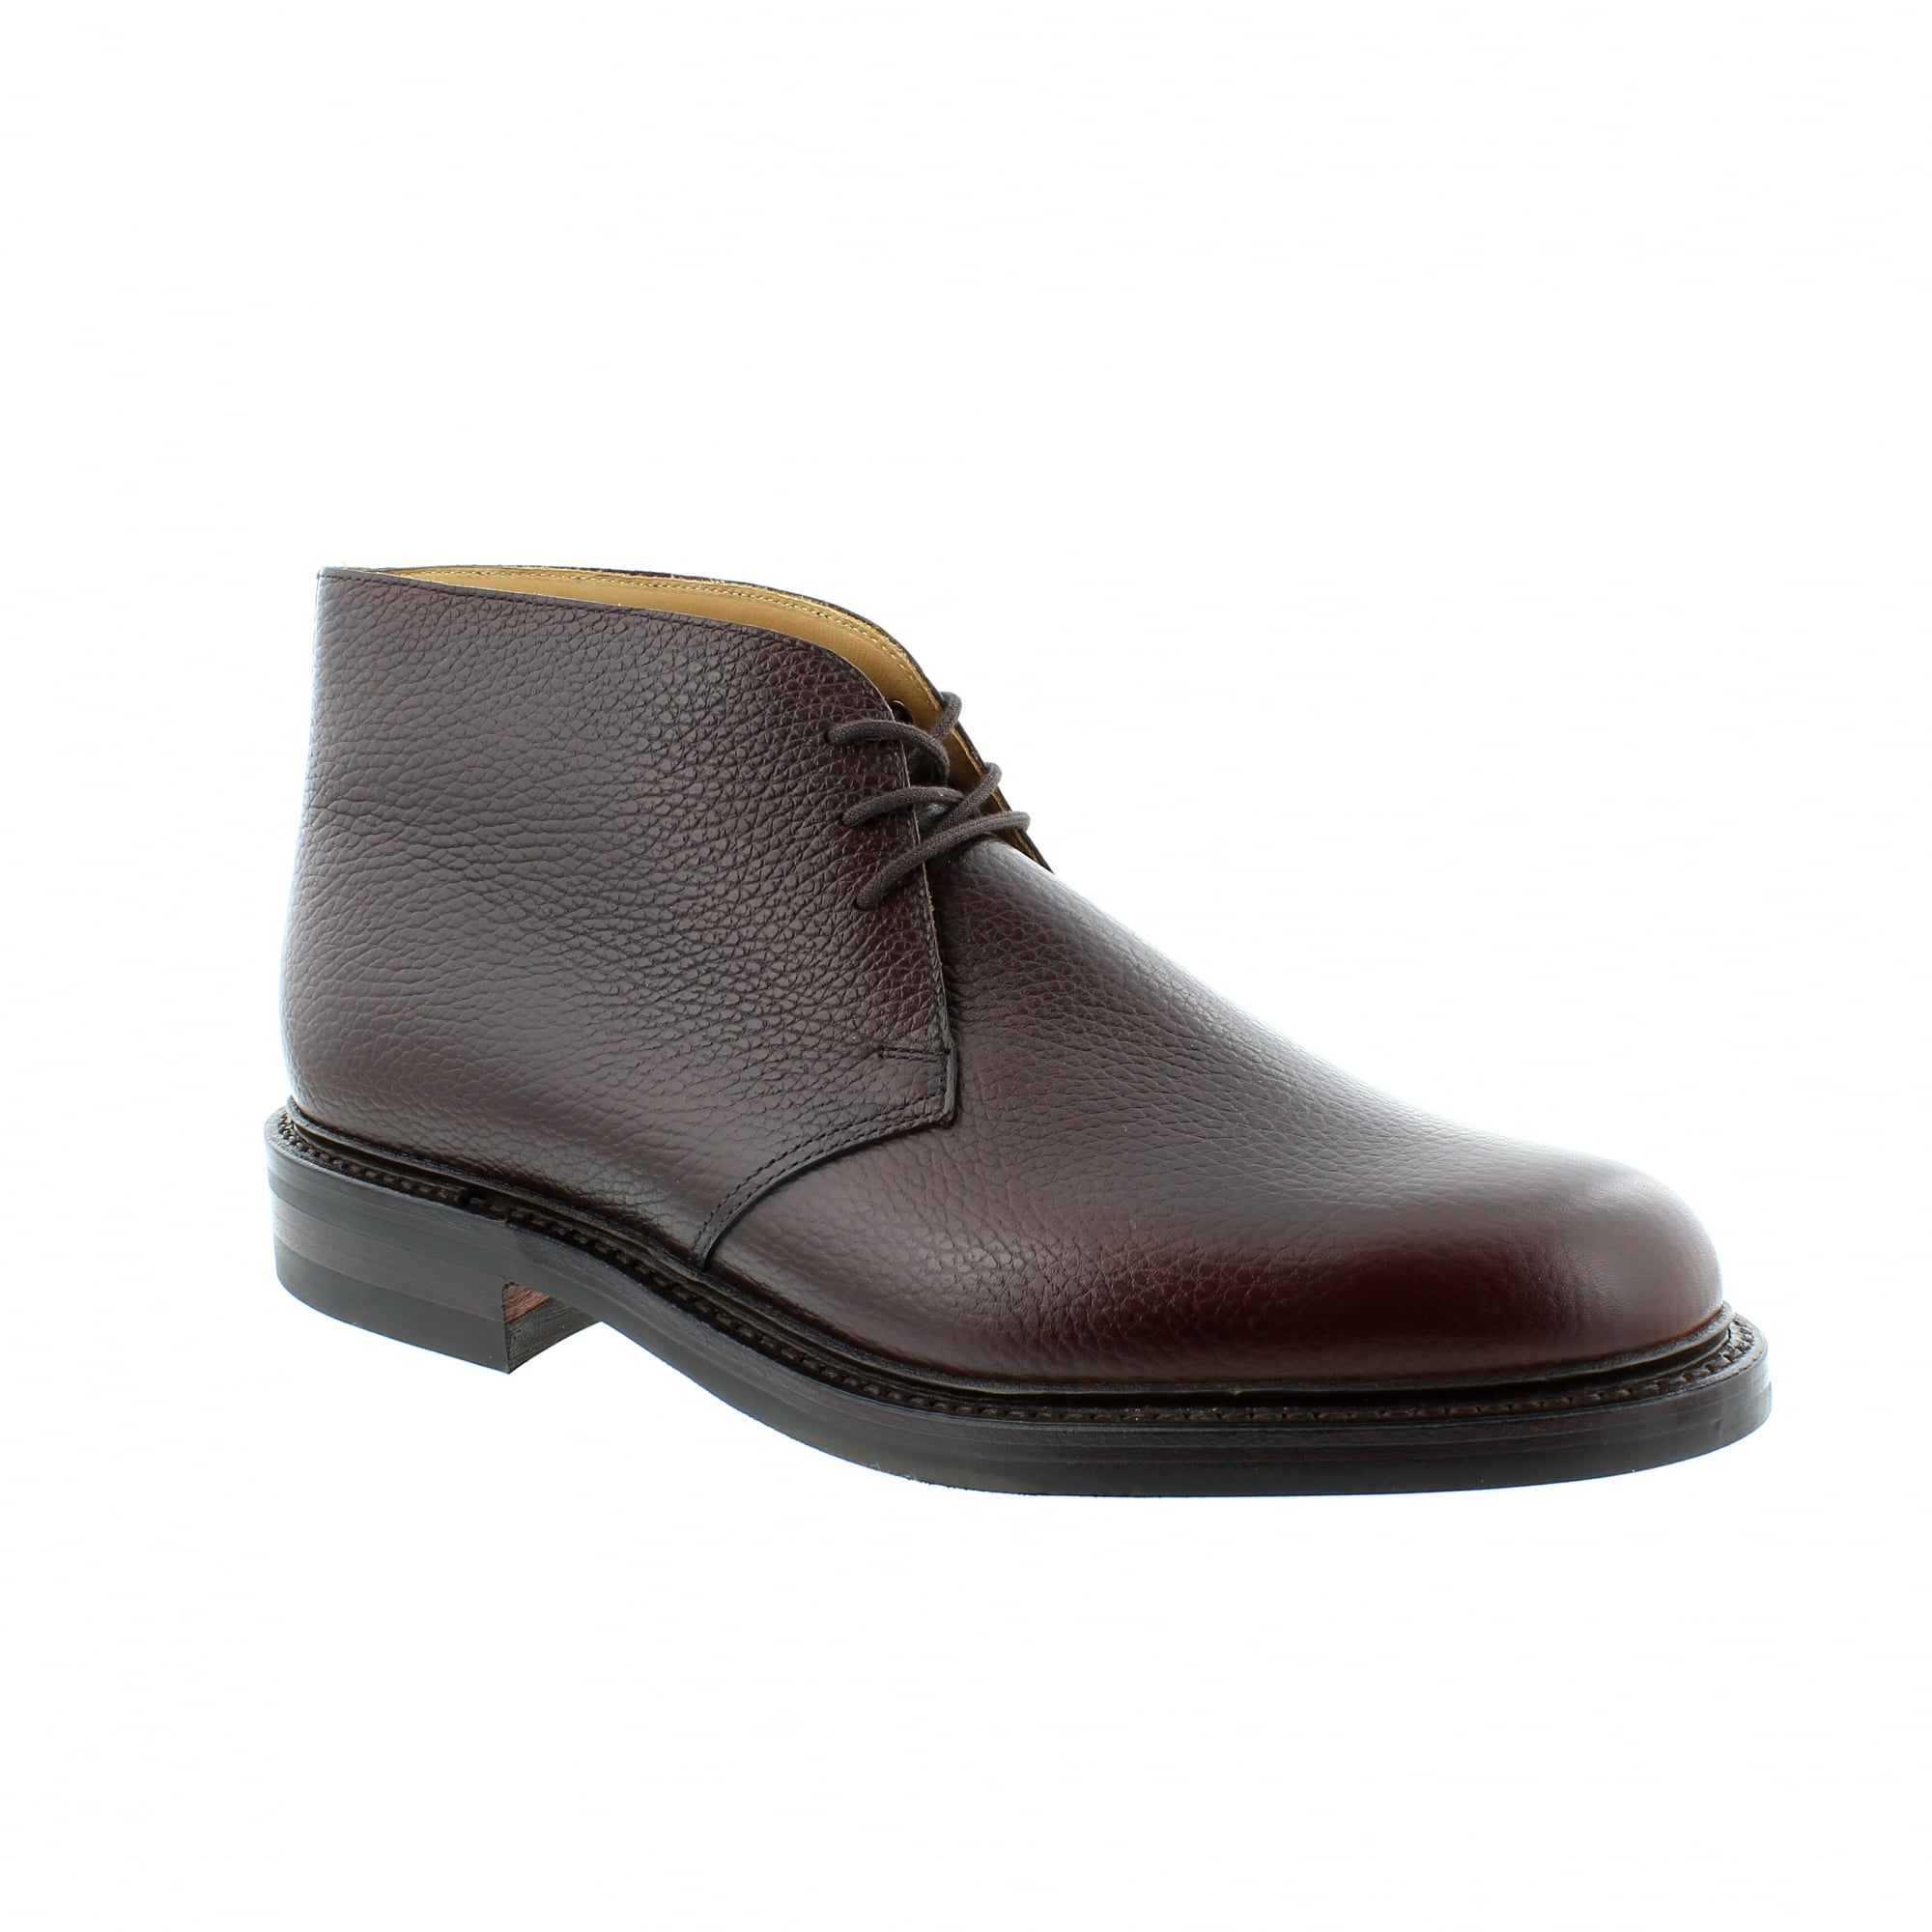 Crockett \u0026 Jones Uist 6223 Chukka Boots